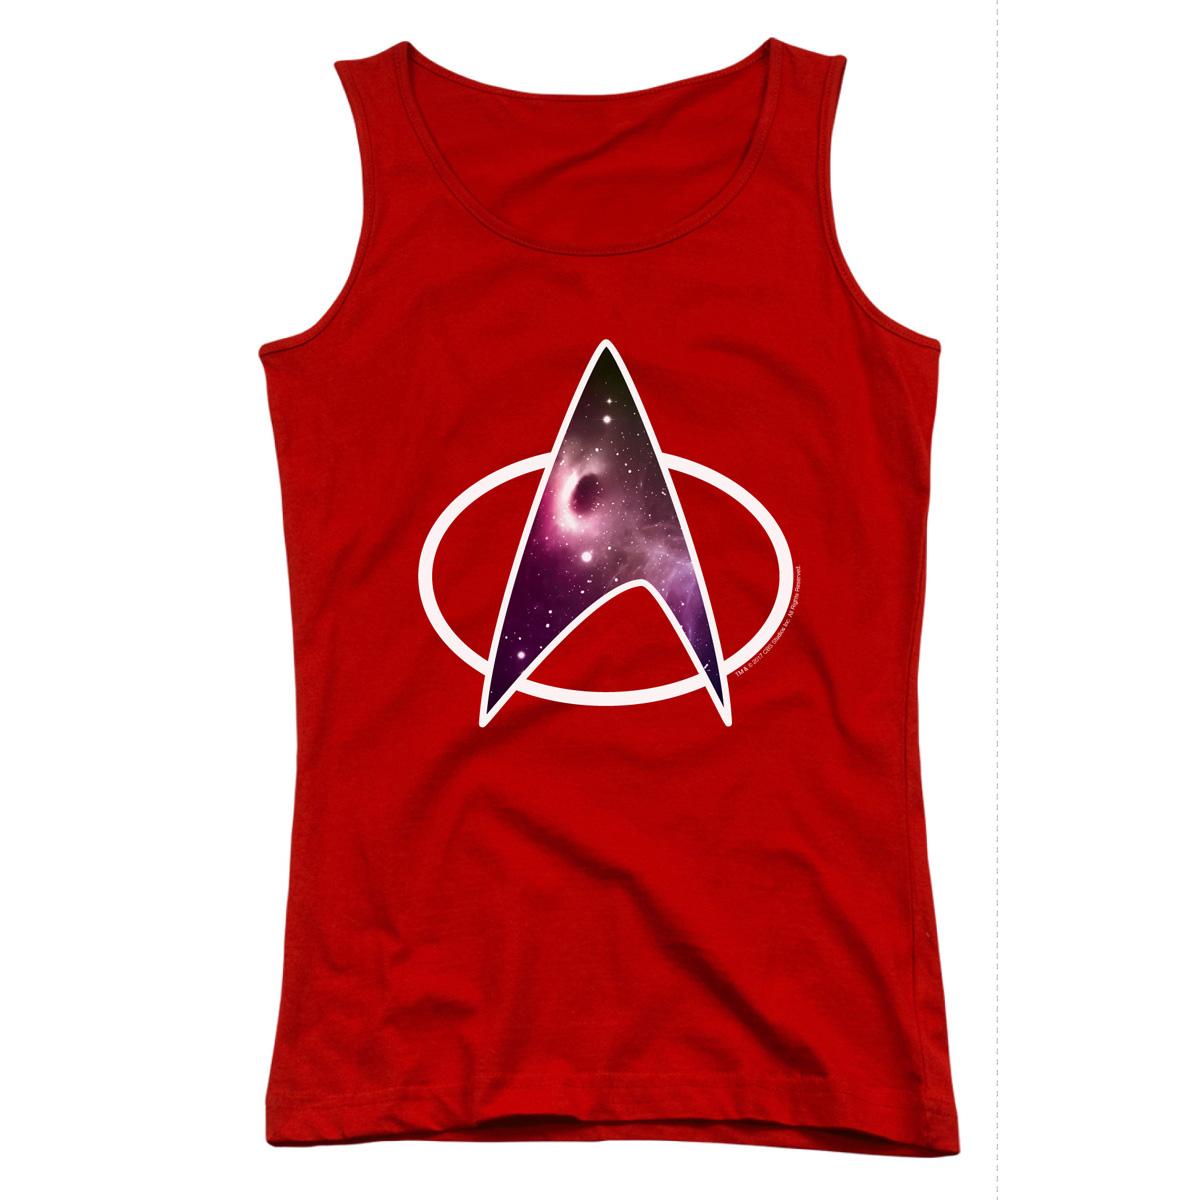 Star Trek The Next Generation Space Delta Women's Tank